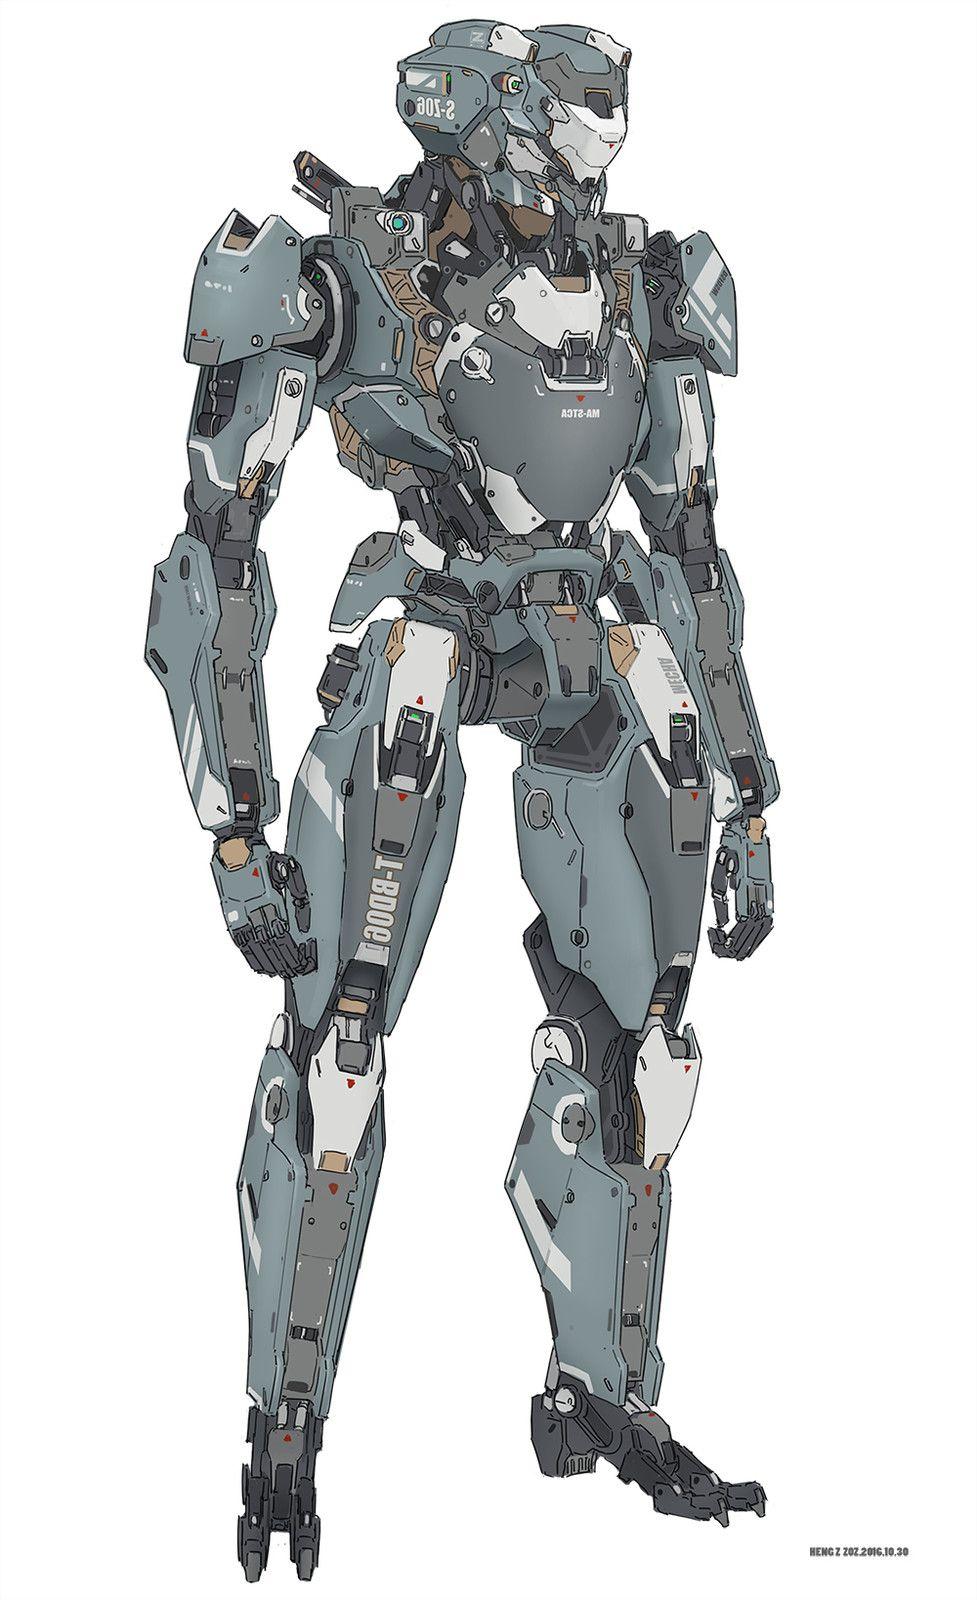 Pin By Messymaru On Mecha Robot Illustrations Robot